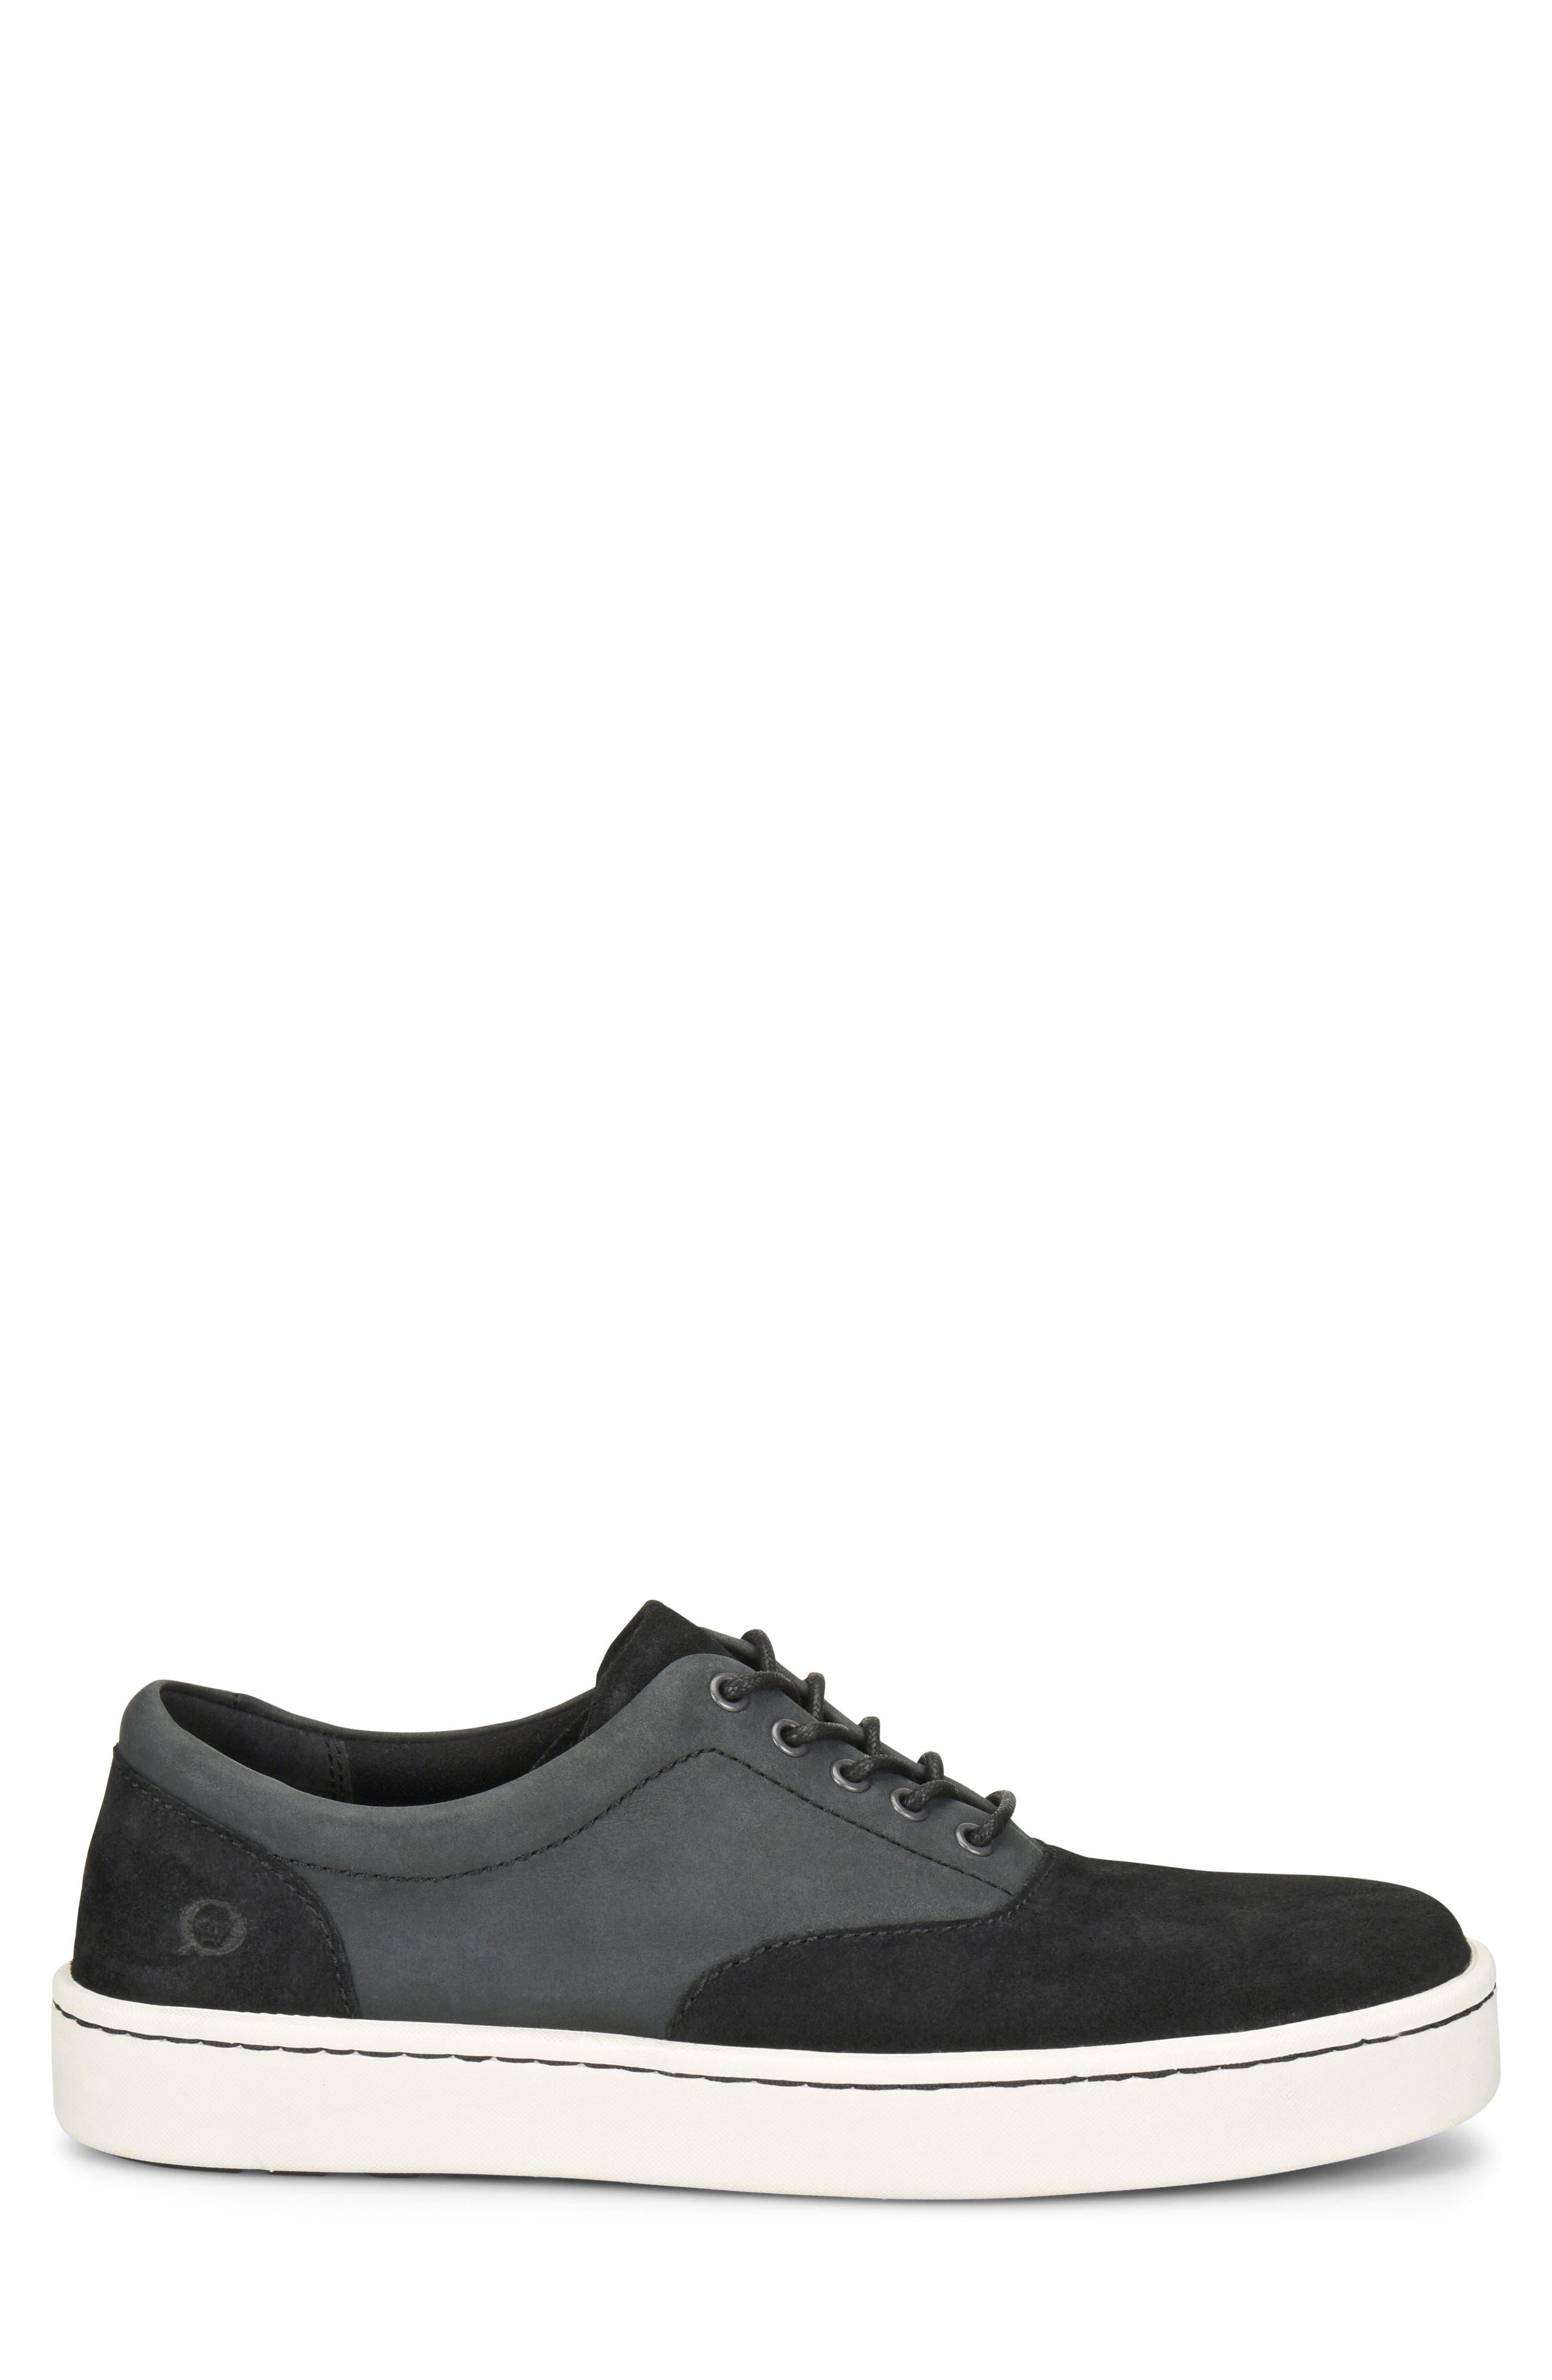 Keystone Low Top Sneaker,                             Alternate thumbnail 3, color,                             001